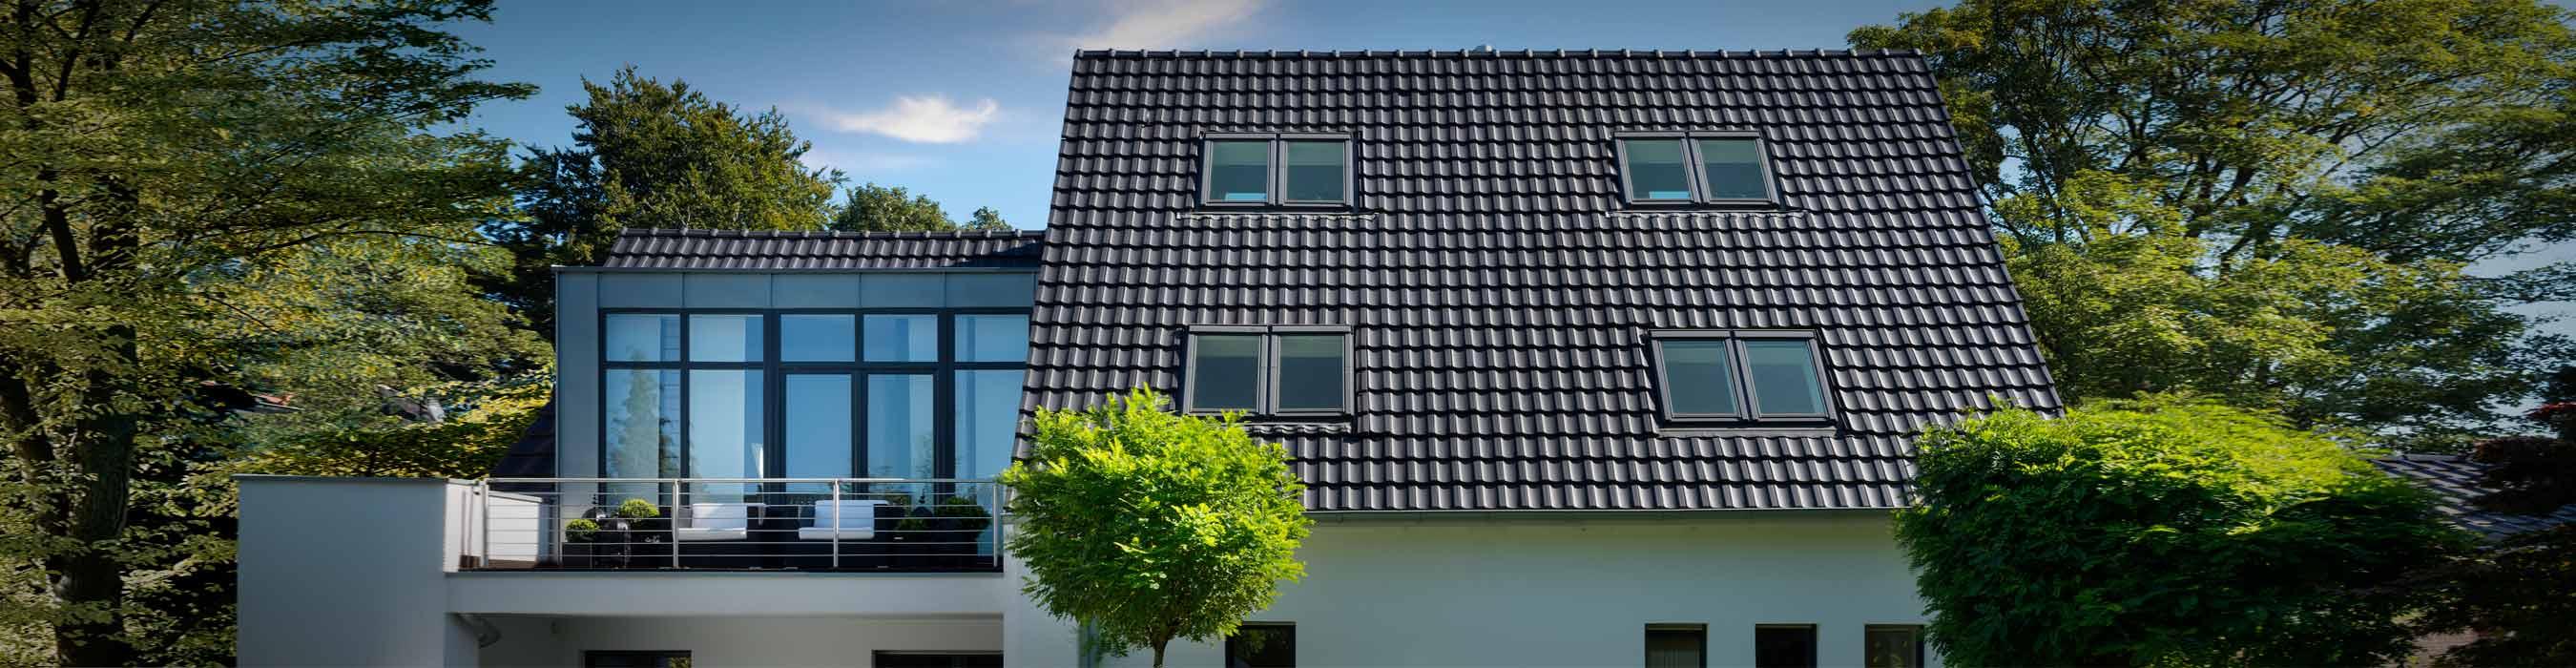 Referenzobjekt mit Laumans Dachziegel RHEINLAND VARIABEL in Farbe Nr. 30 – xenon-grau